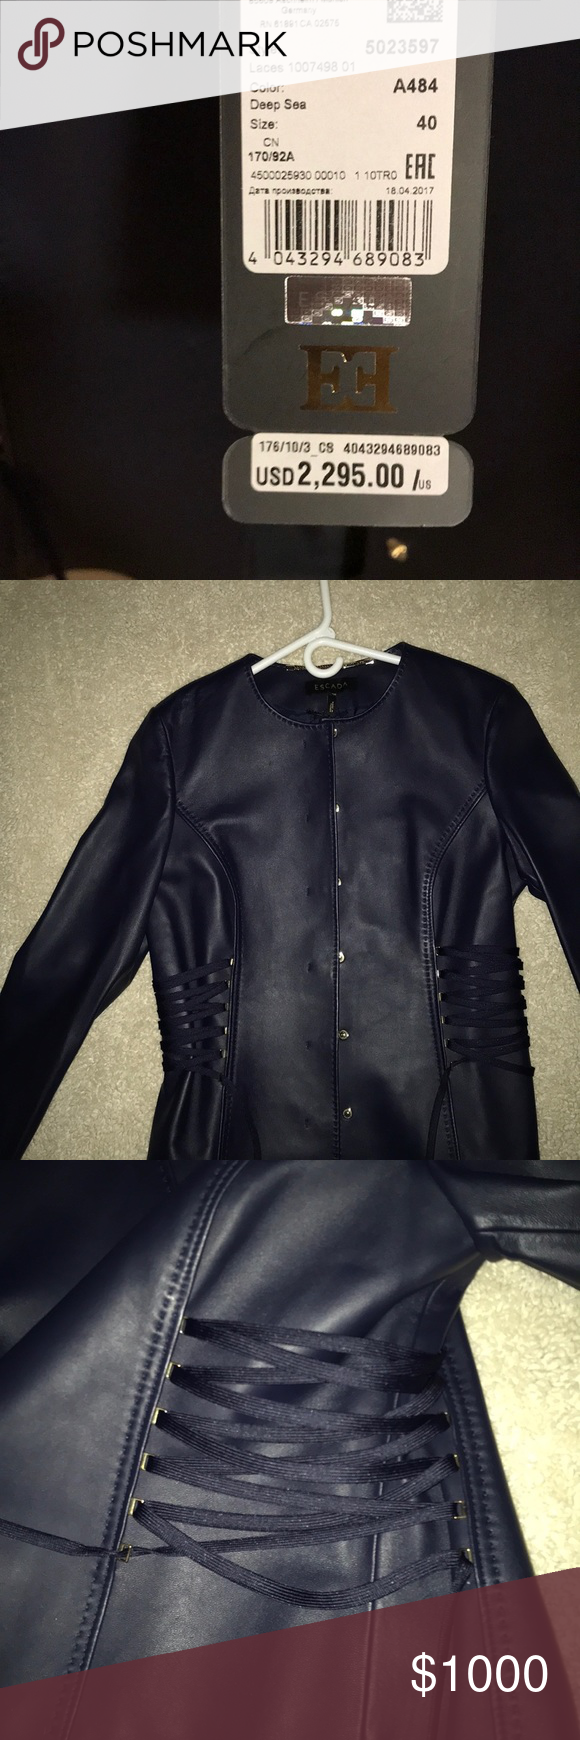 Beautiful Escada Leather Jacket Leather Jacket Jackets Escada Jacket [ 1740 x 580 Pixel ]